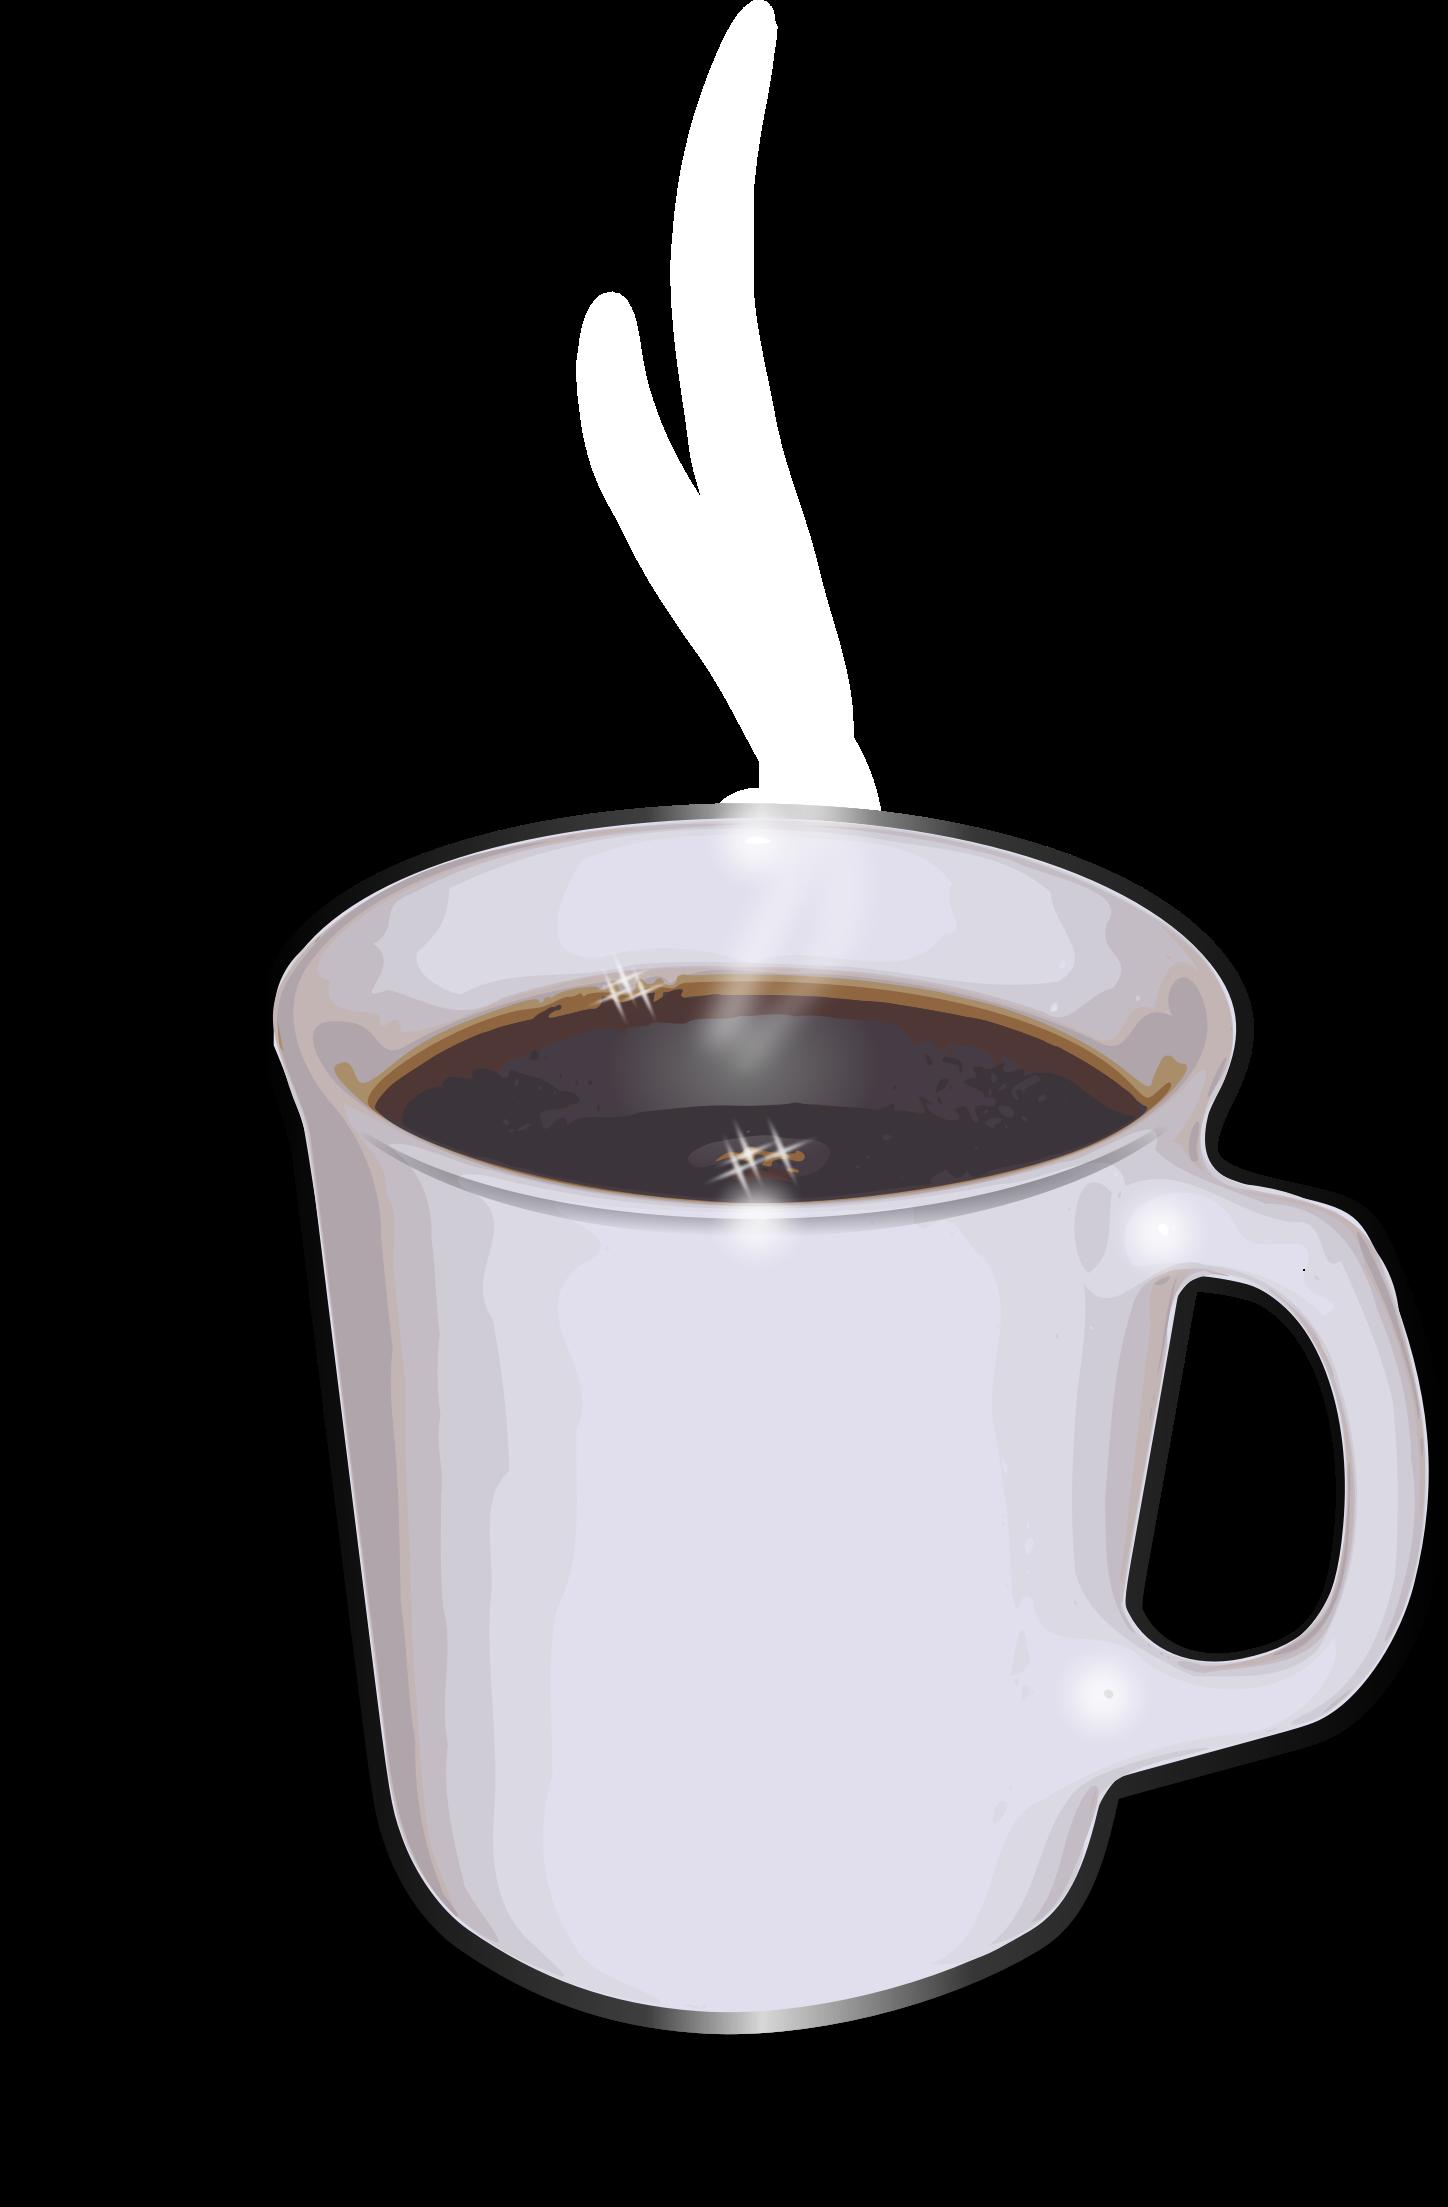 Cool clipart joe. Hot cuppa big image